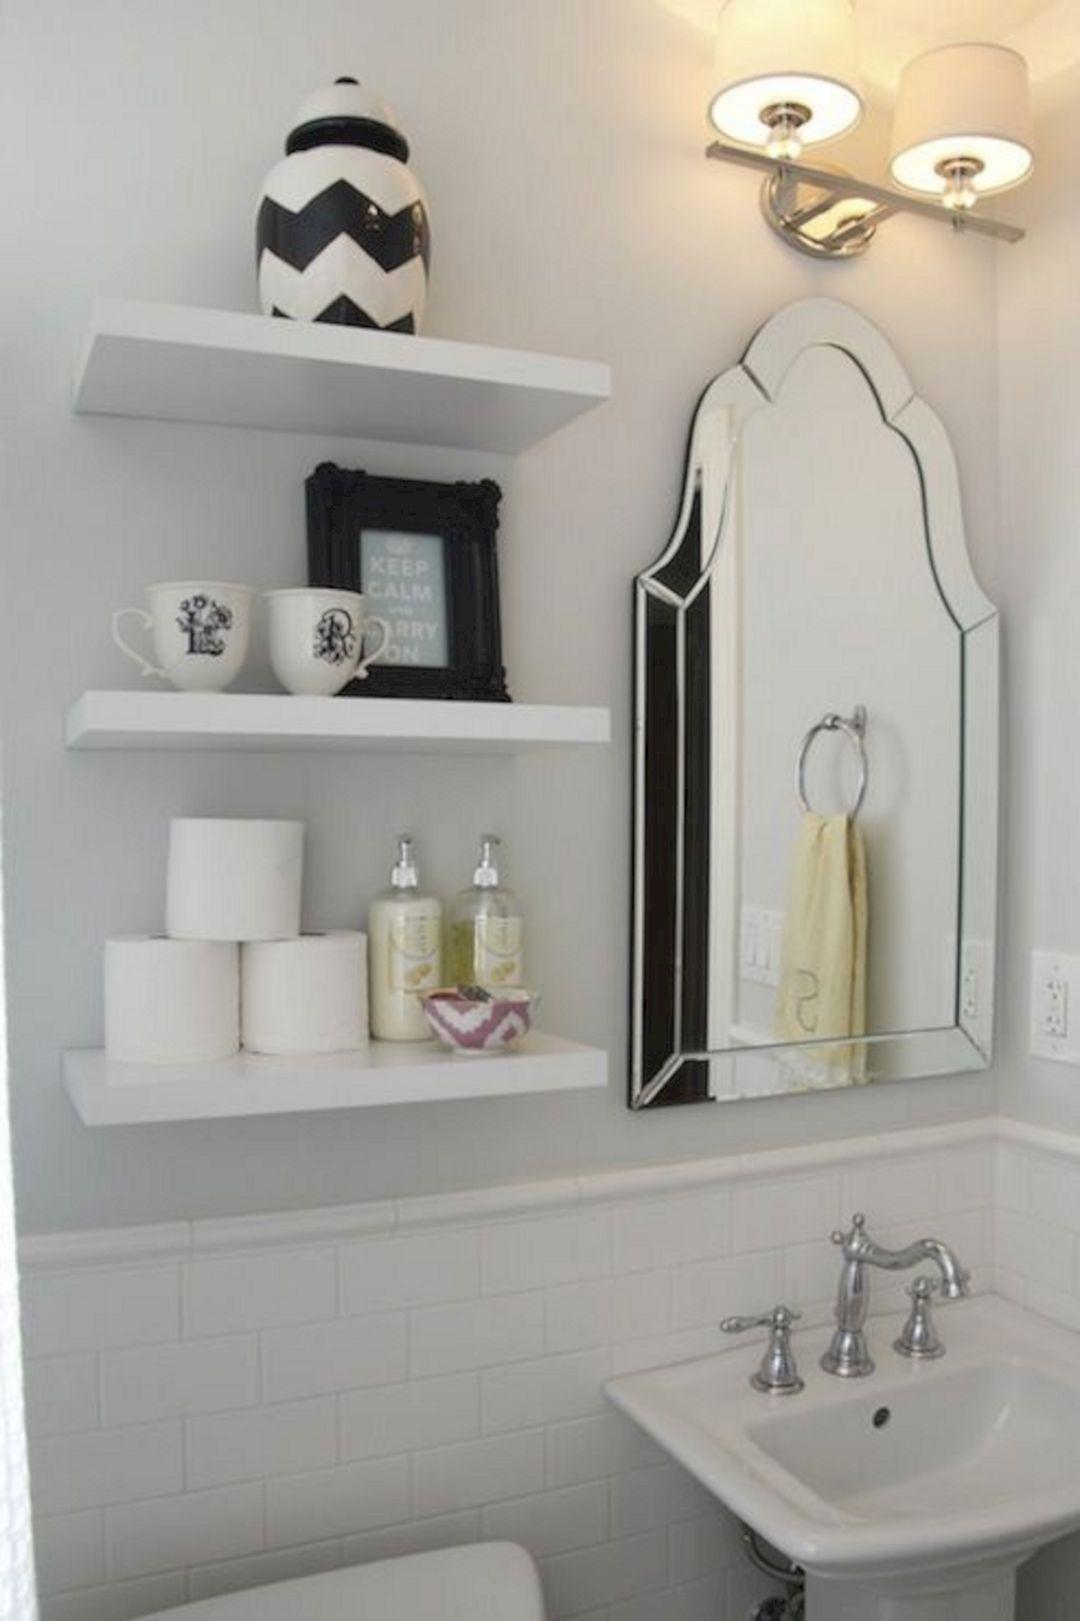 Bathroom Wall Shelves Ideas 12